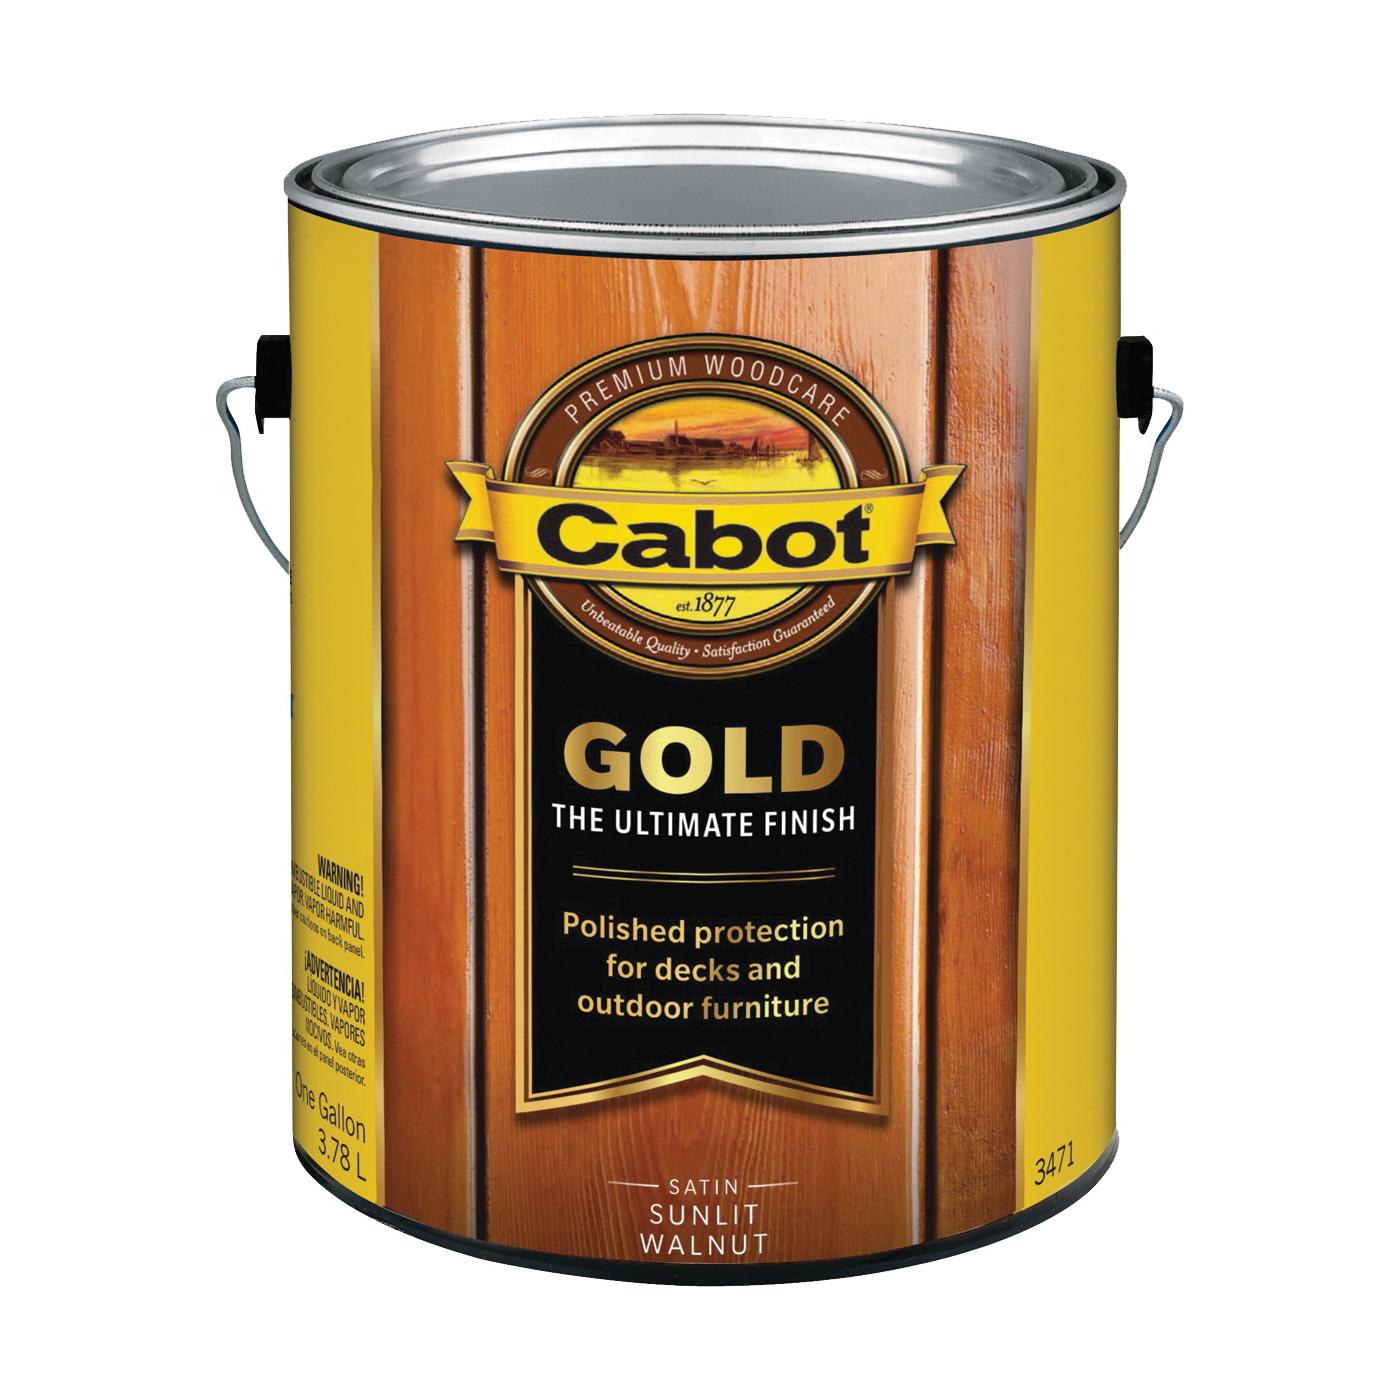 Cabot 3471